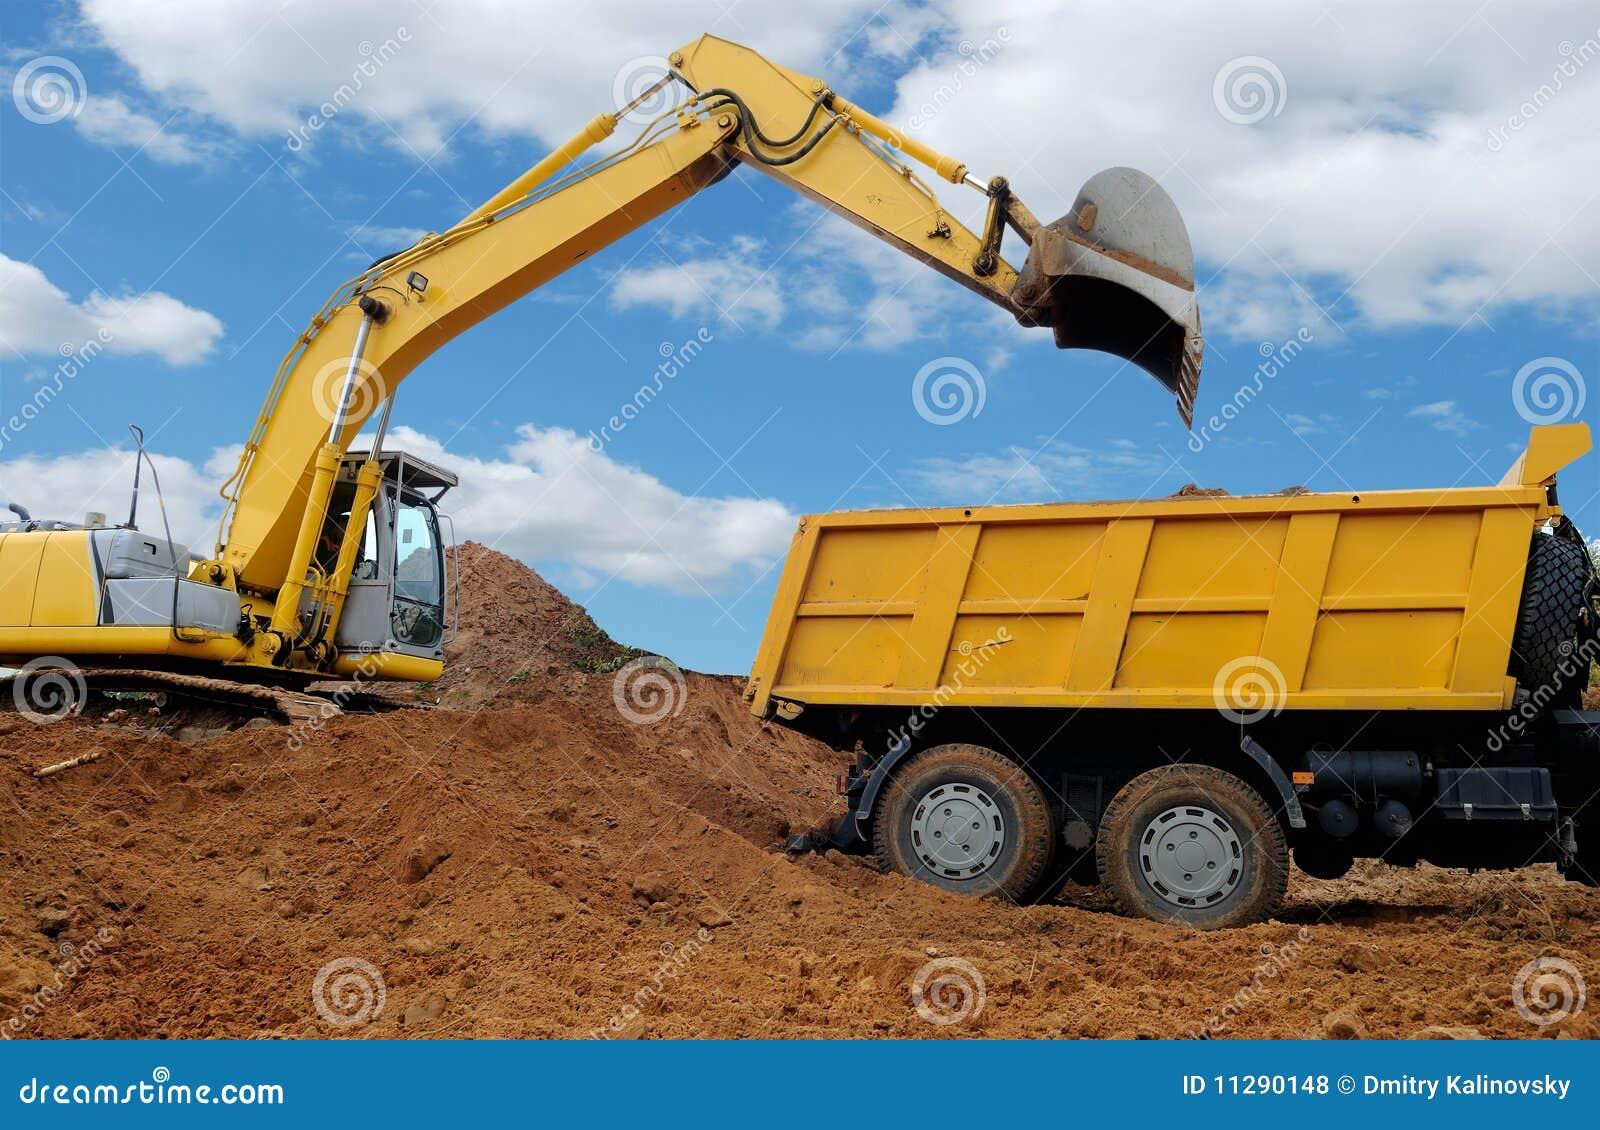 excavator loading dumper truck royalty free stock photos image